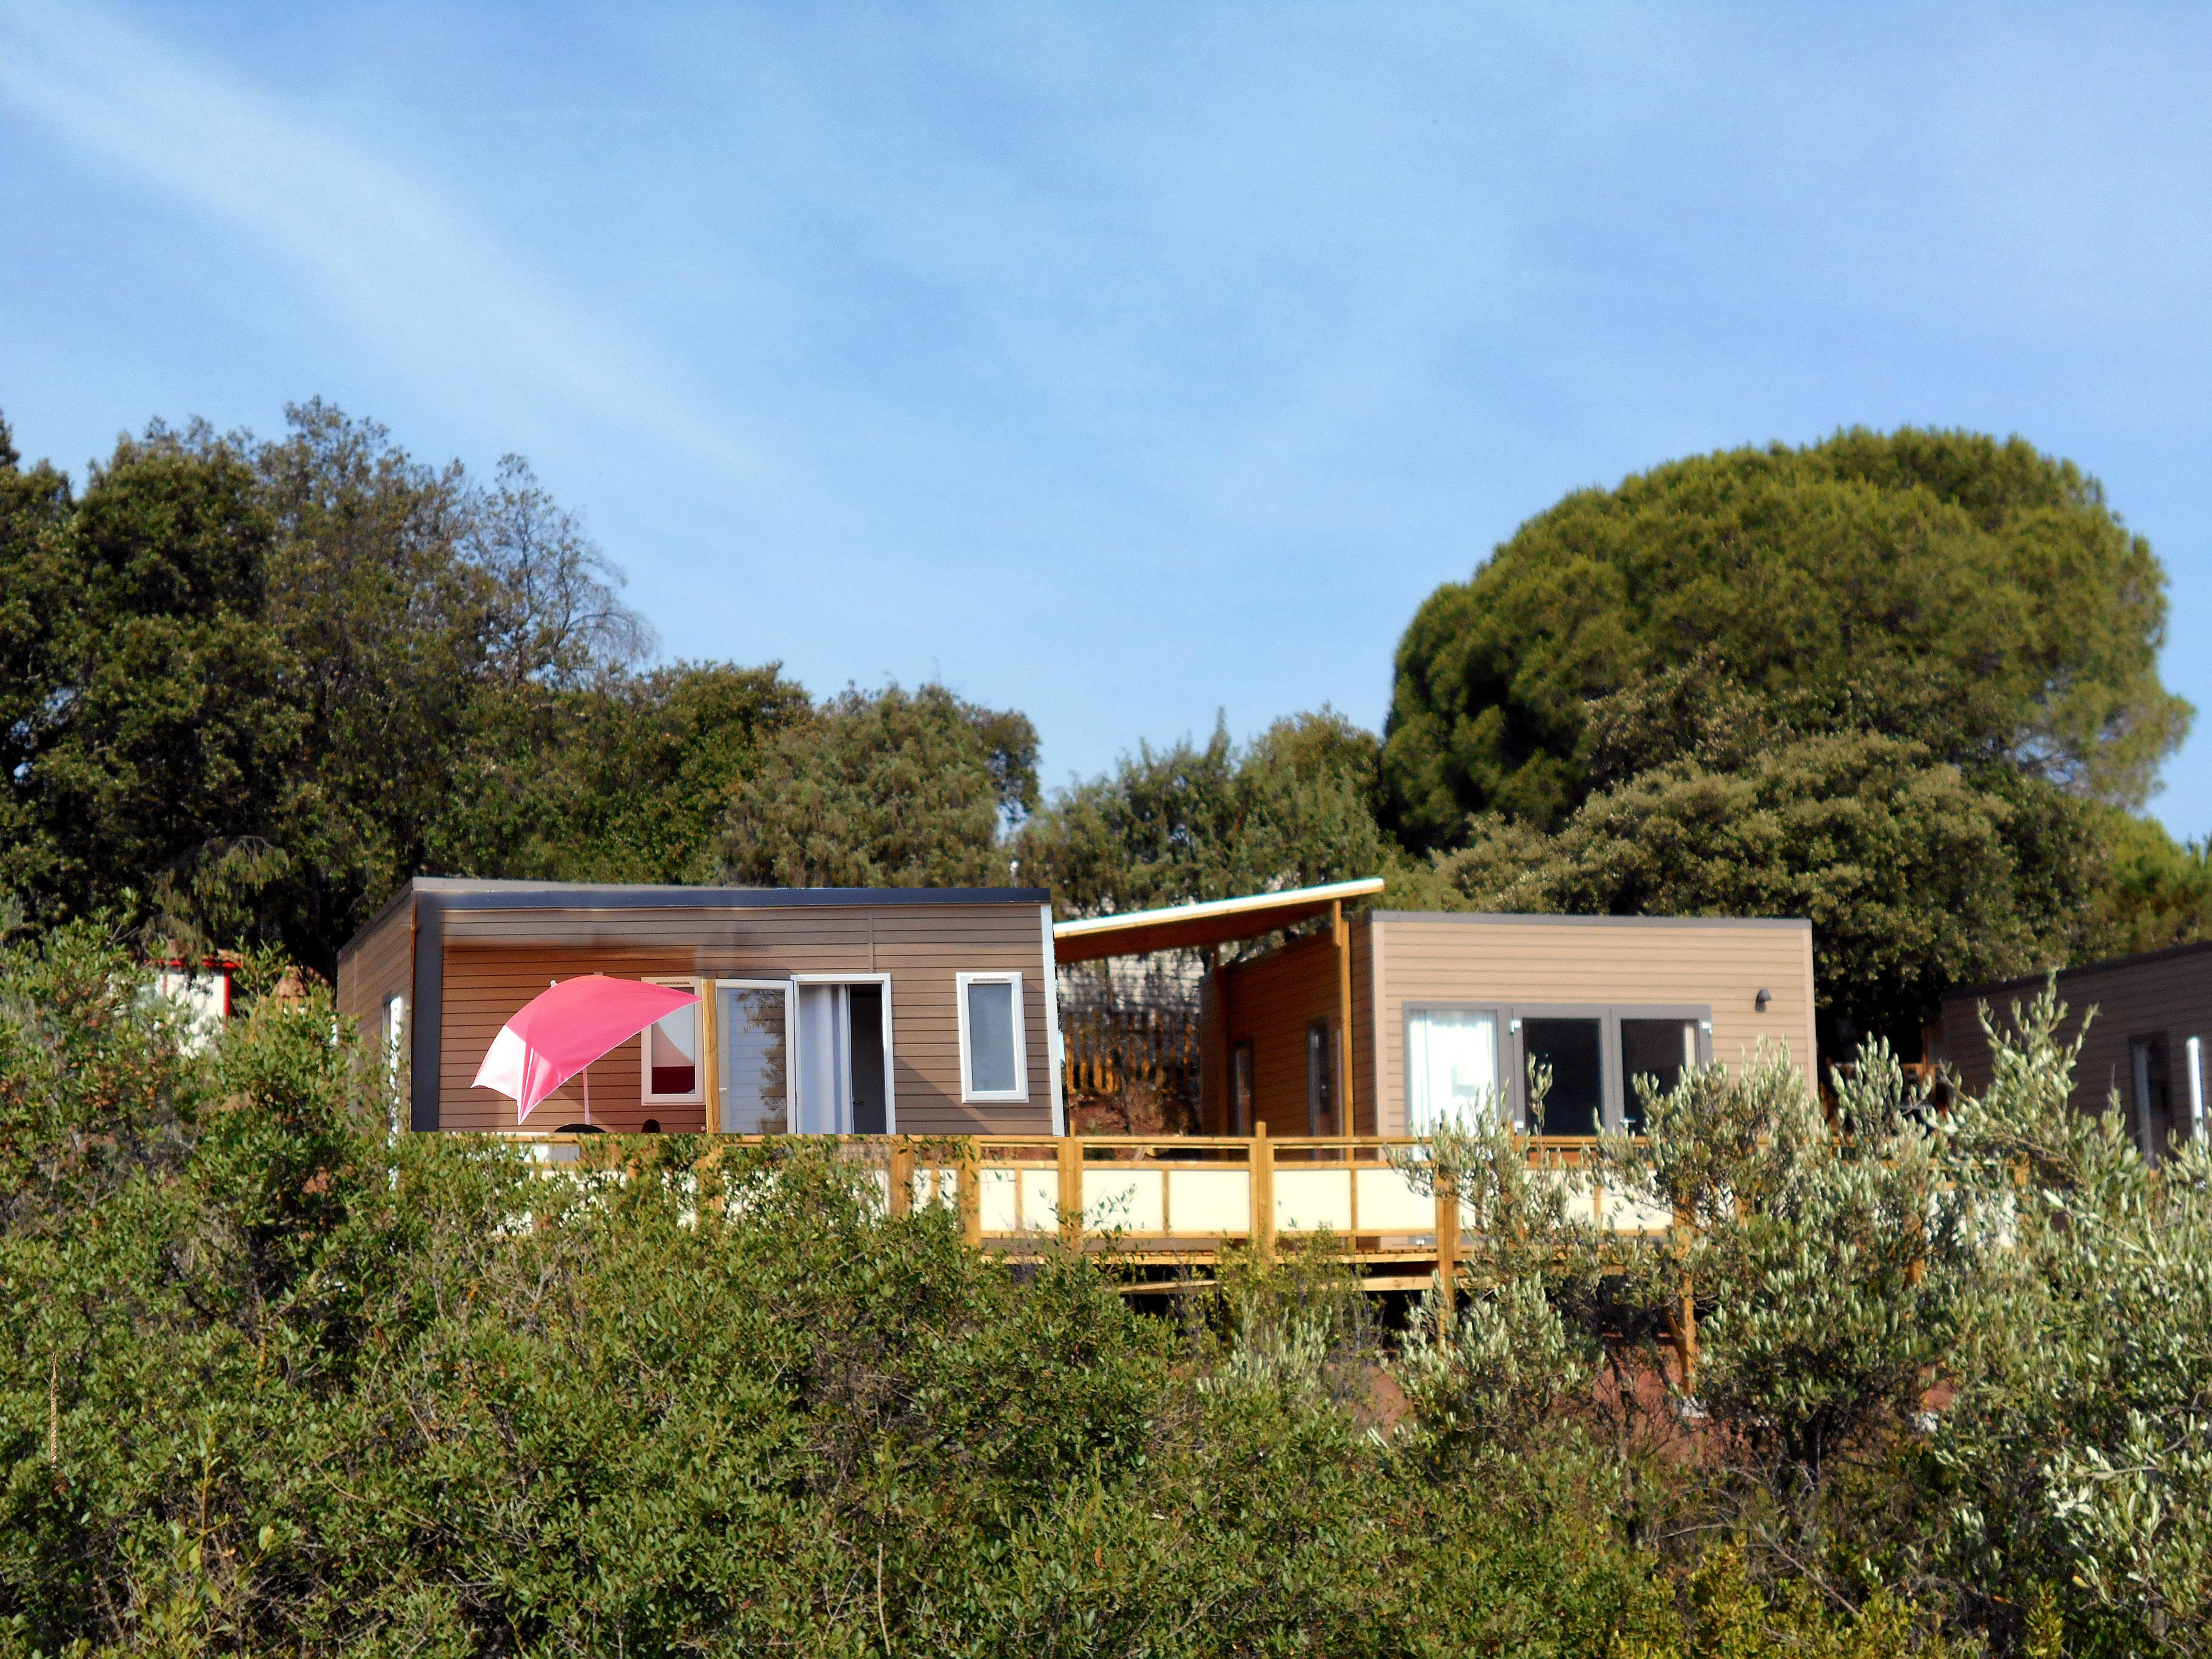 Location - Mobil Homes Duo Amerique 6 Pers : 1 Utah + 1 Tennessy Indépendants Avec Terrasse Commune + 1 Place Véhicule - Camping Les Cigales